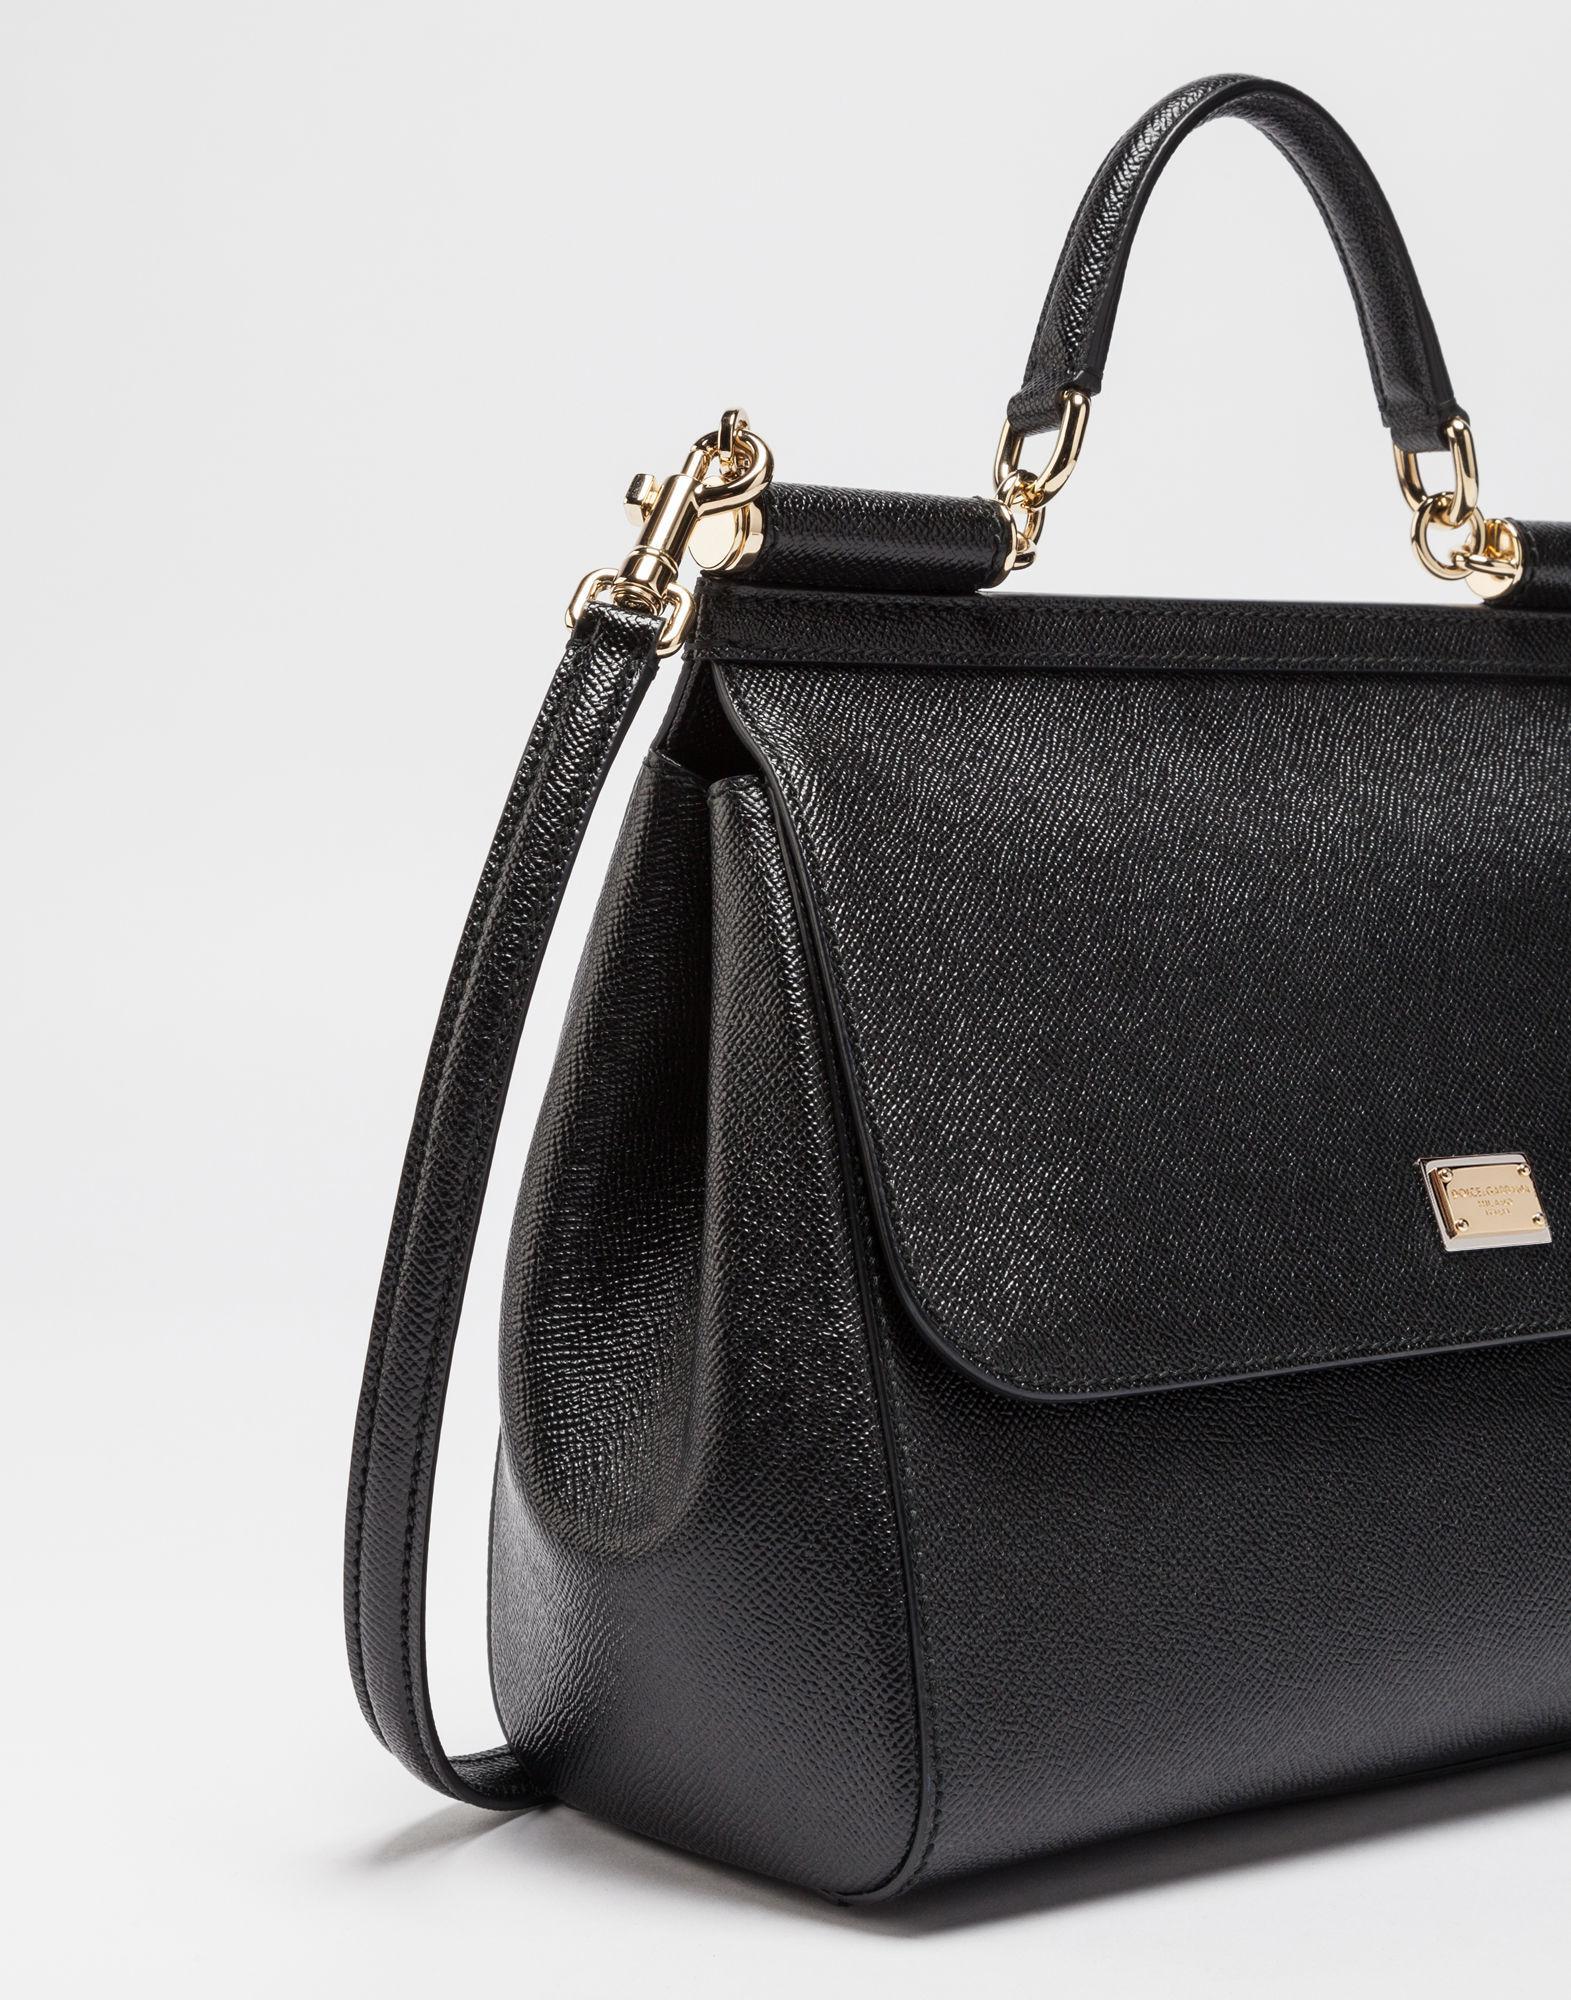 23fdd78b204e Lyst - Dolce   Gabbana Borsa A Mano in Black